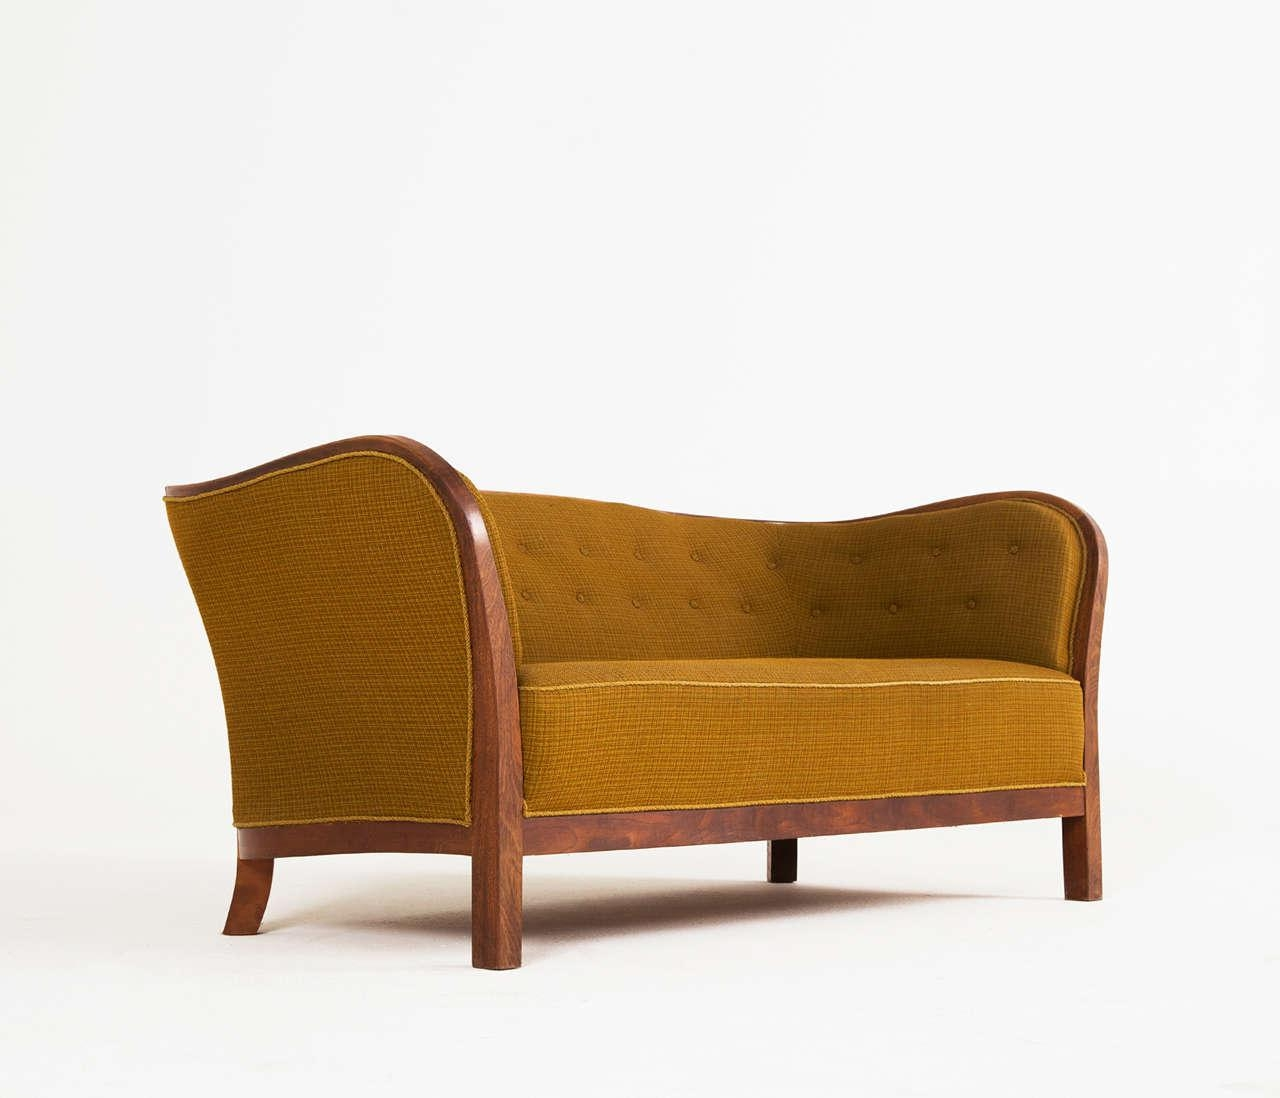 Sofas Center : Art Deco Sofas And Chairs Sofaor Sale Set Inside Art Deco Sofa And Chairs (Image 15 of 20)